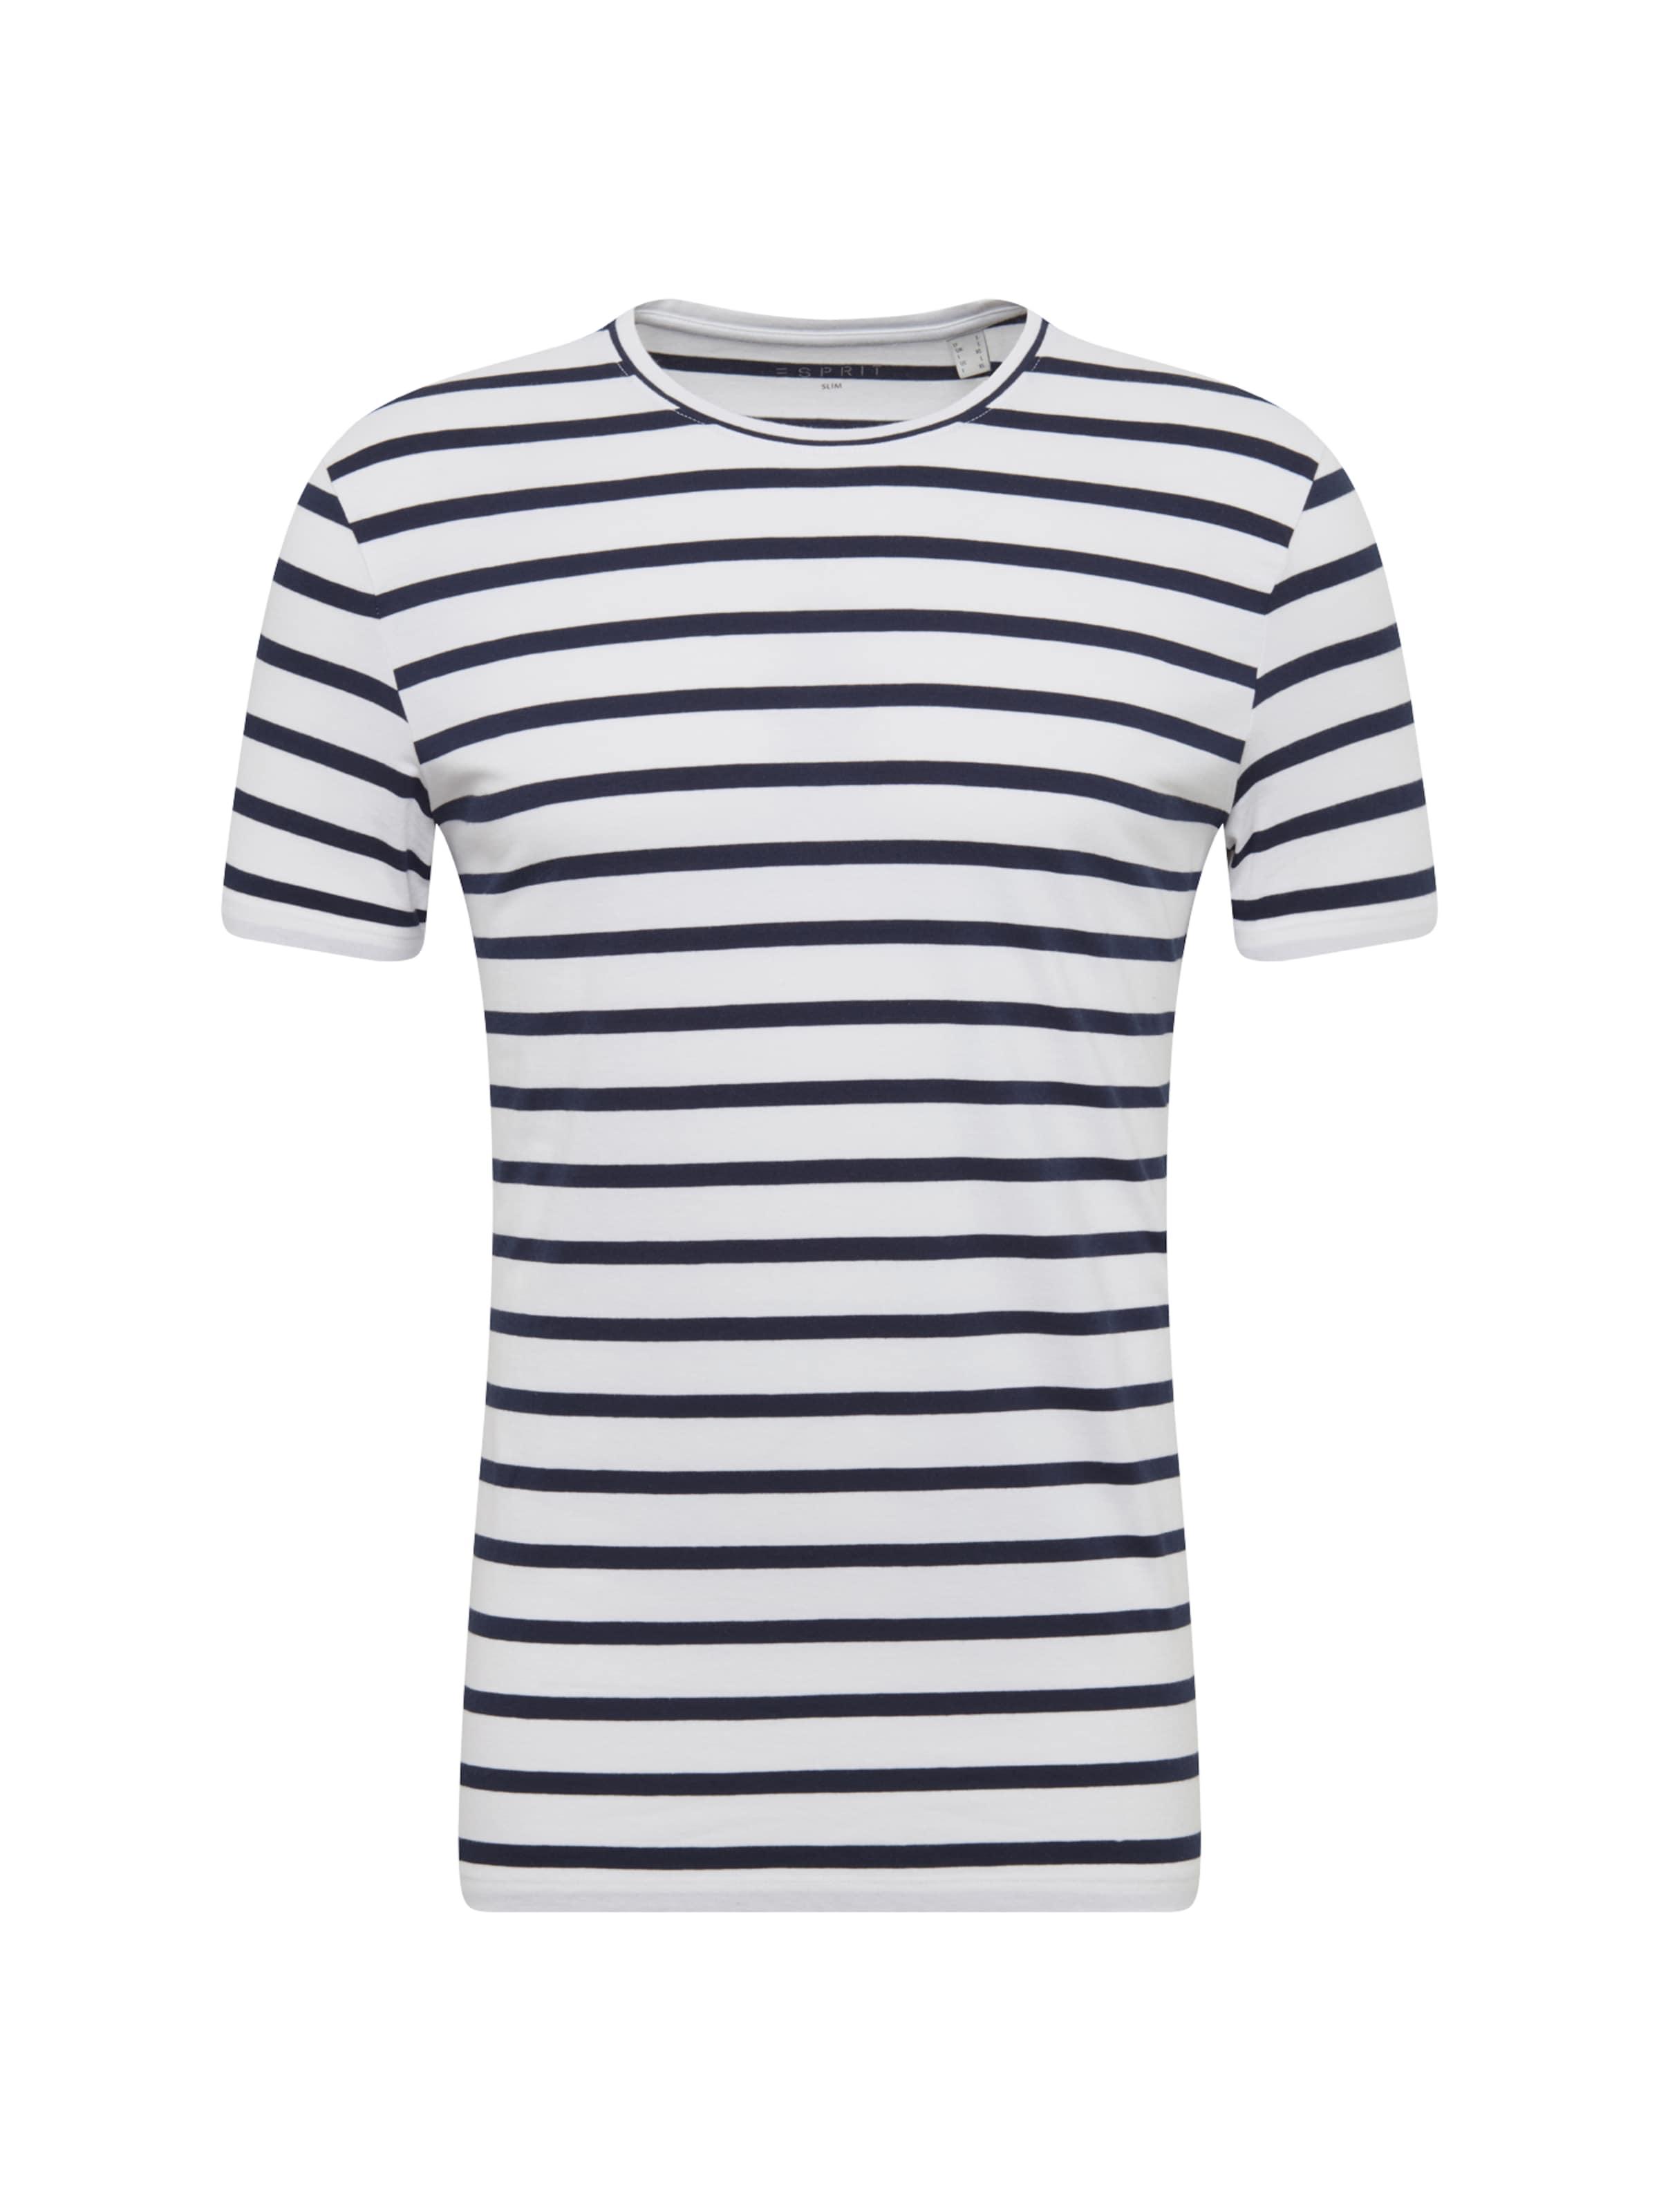 shirt En Blanc Noir Esprit T Fwqg66